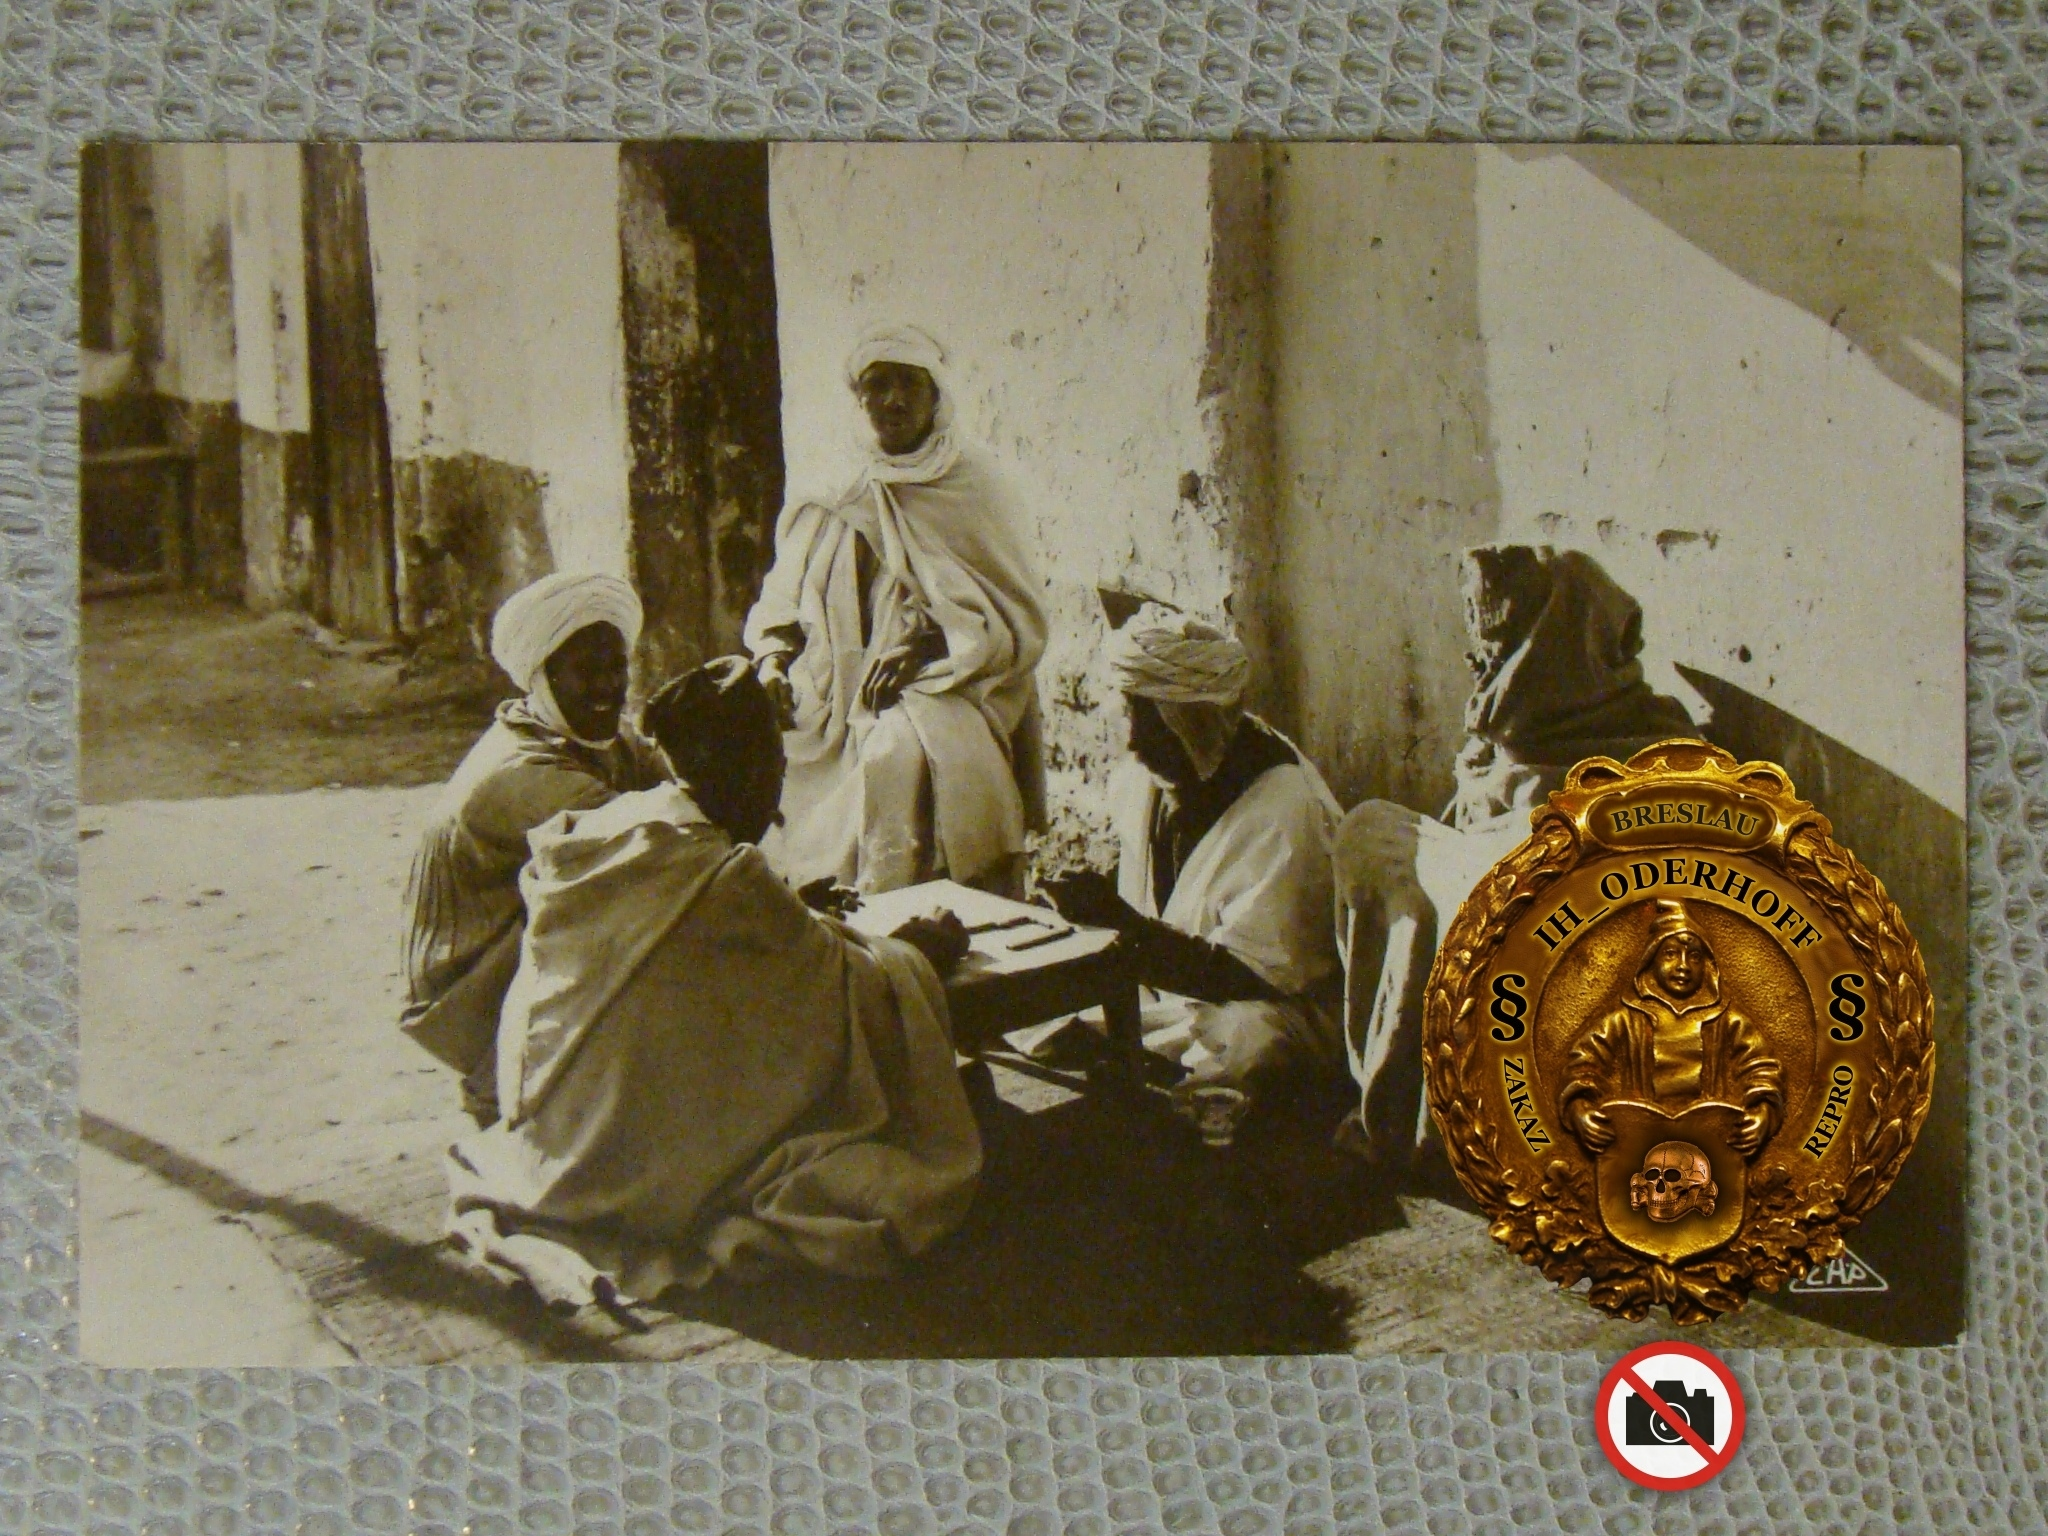 Tunis Etno,Orgifoto,Lux,B6718